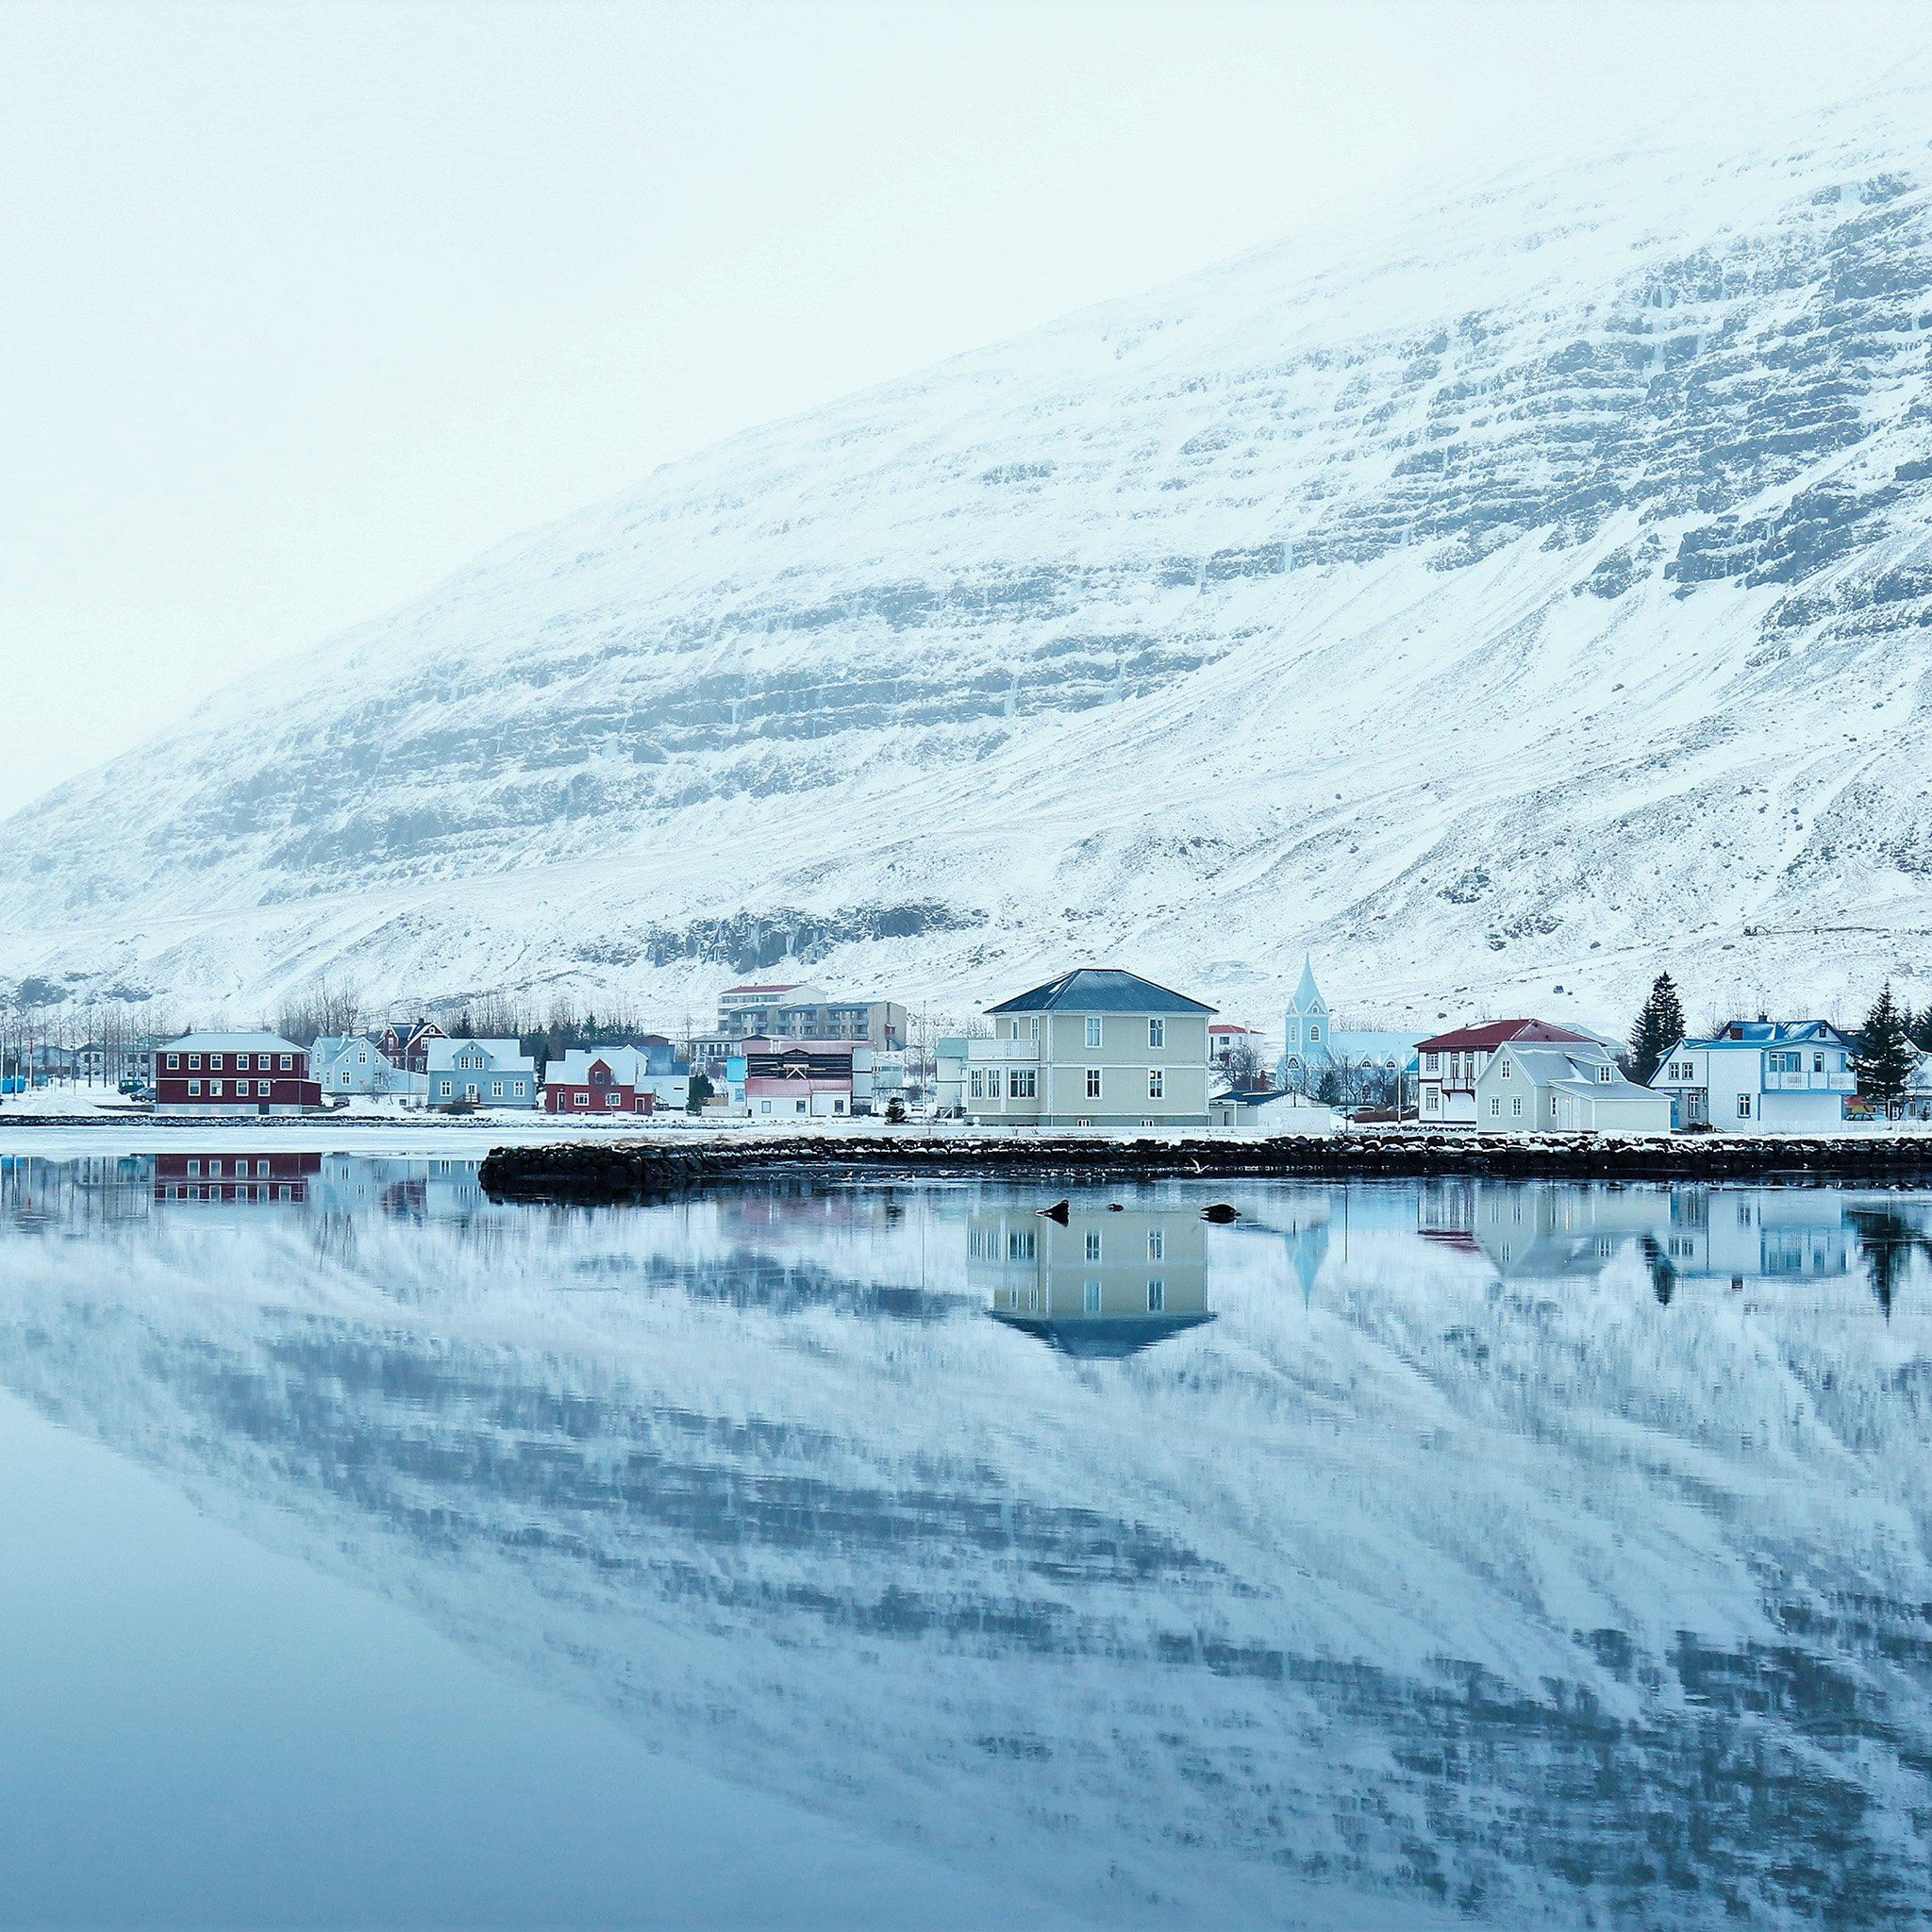 Winter Christmas Mountain Cold Lake iPad Air wallpaper